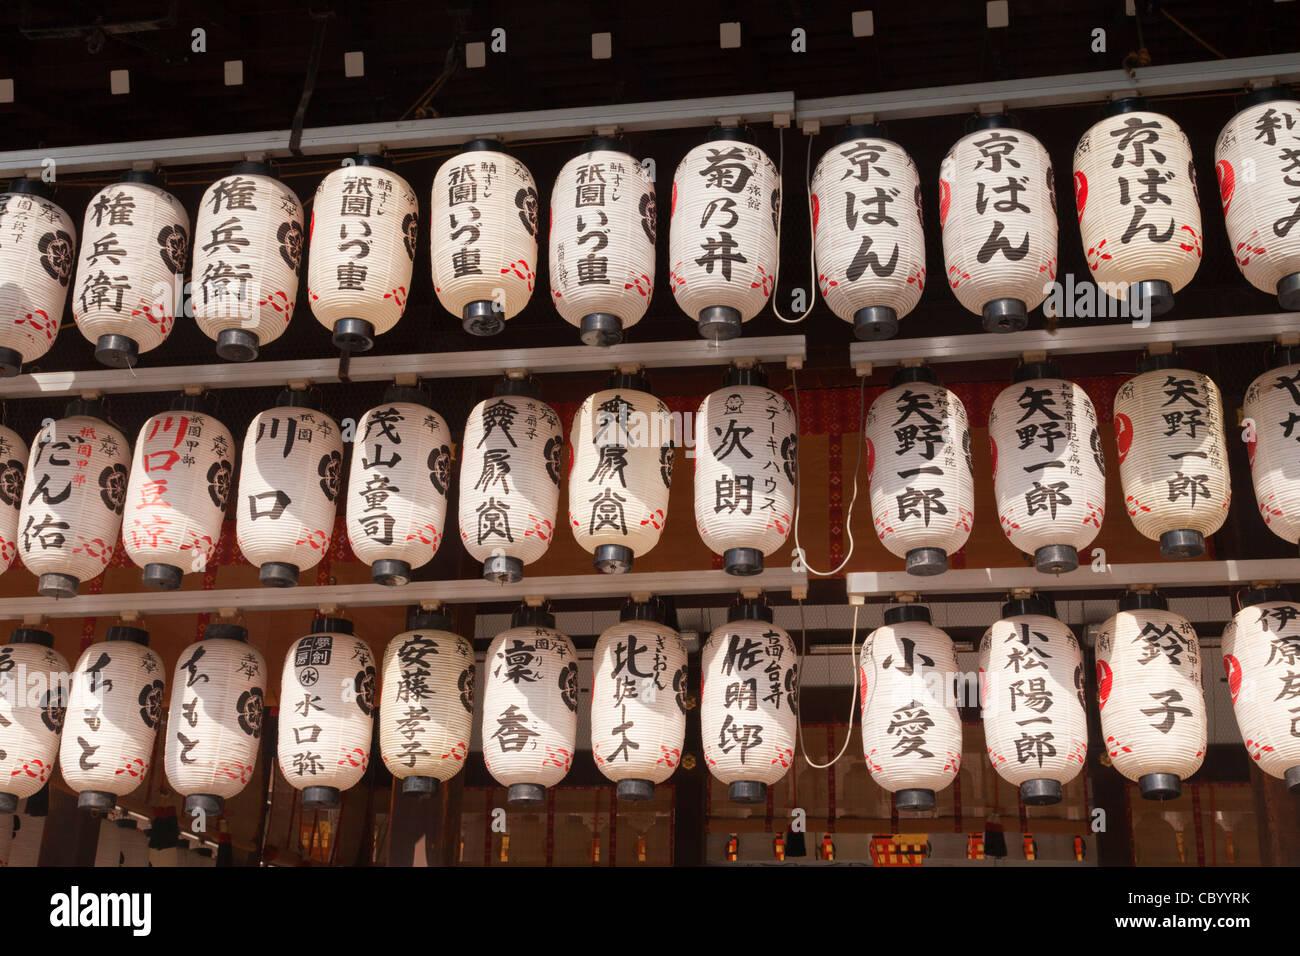 Lanternes suspendu à Ginkaku-ji, Kyoto, Japon. Photo Stock